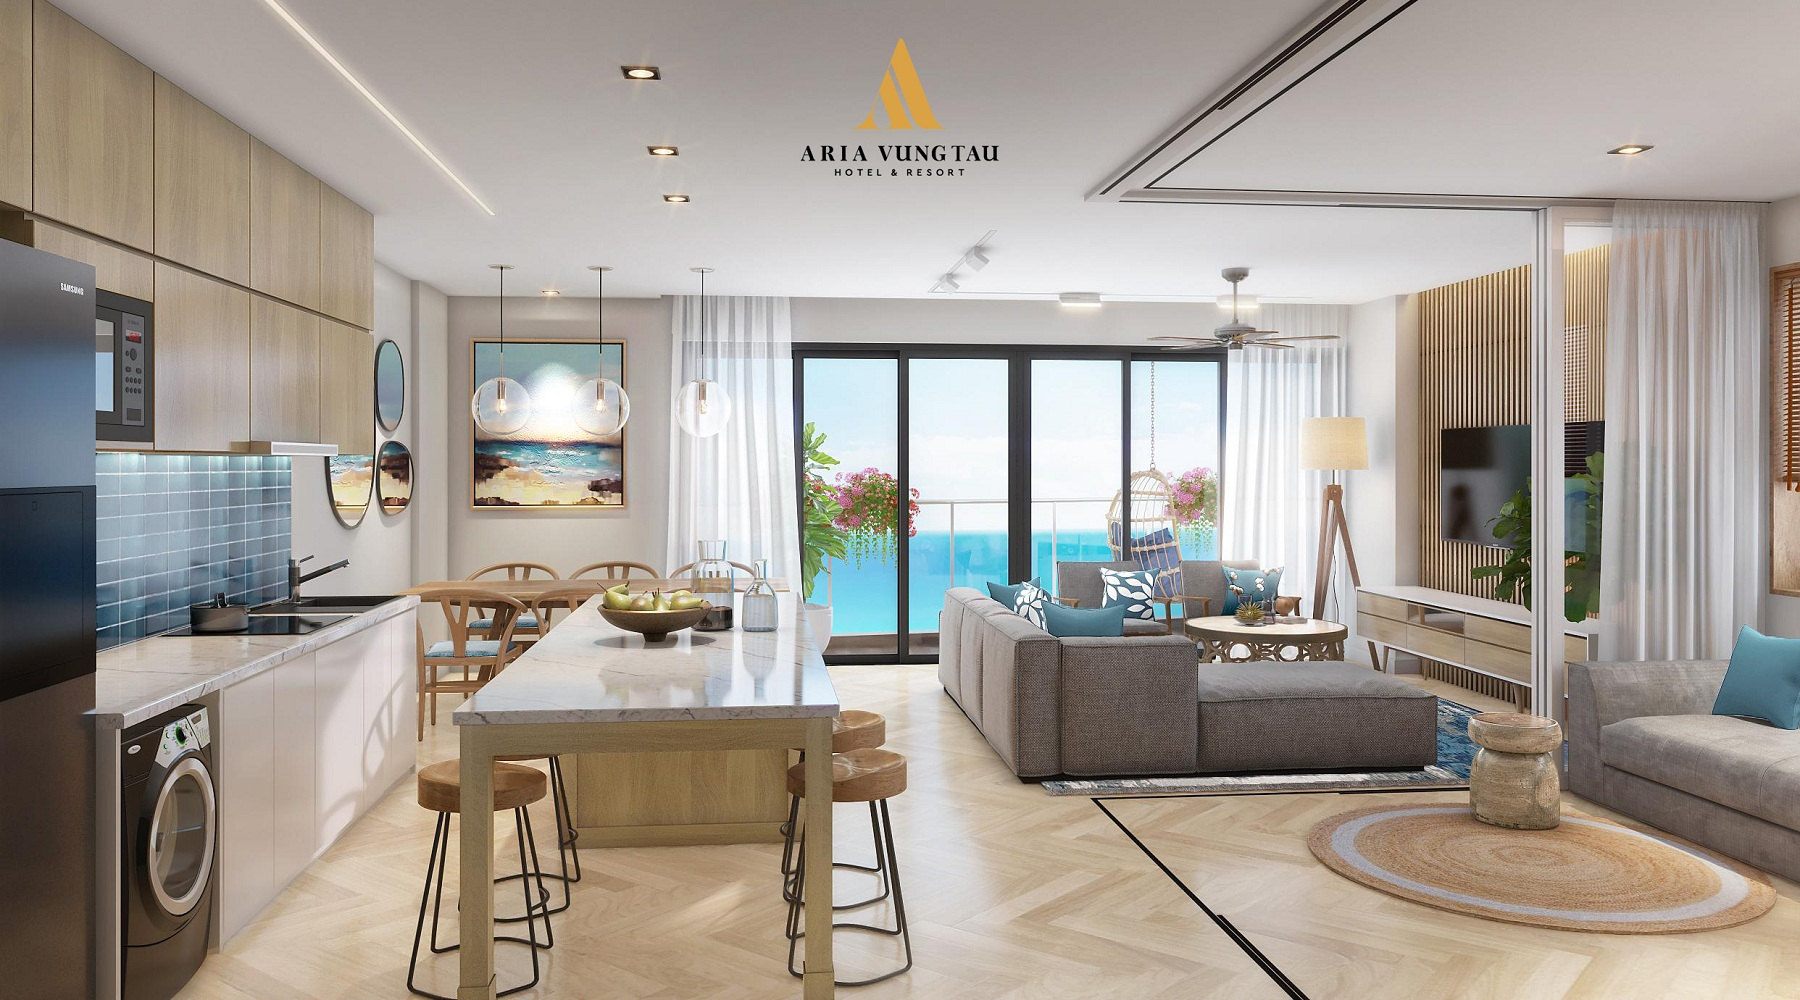 http://charmington.org/public/upload/aria-vung-tau-hotel-resort-living-room-1576246341.jpg